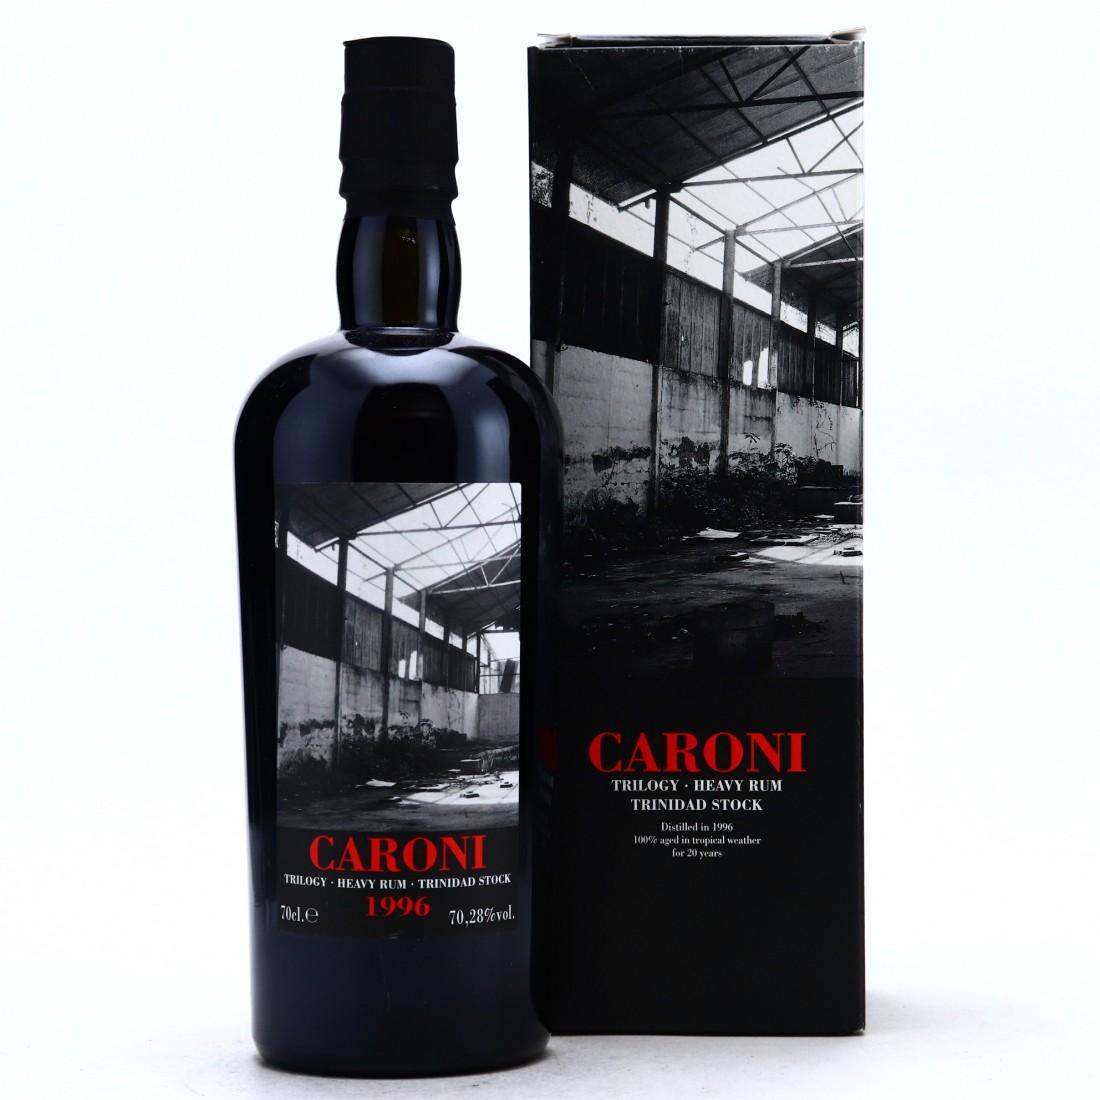 Caroni 1996 Velier 20 Year Old Trinidad Stock Single Cask #R3711 / LMDW Trilogy